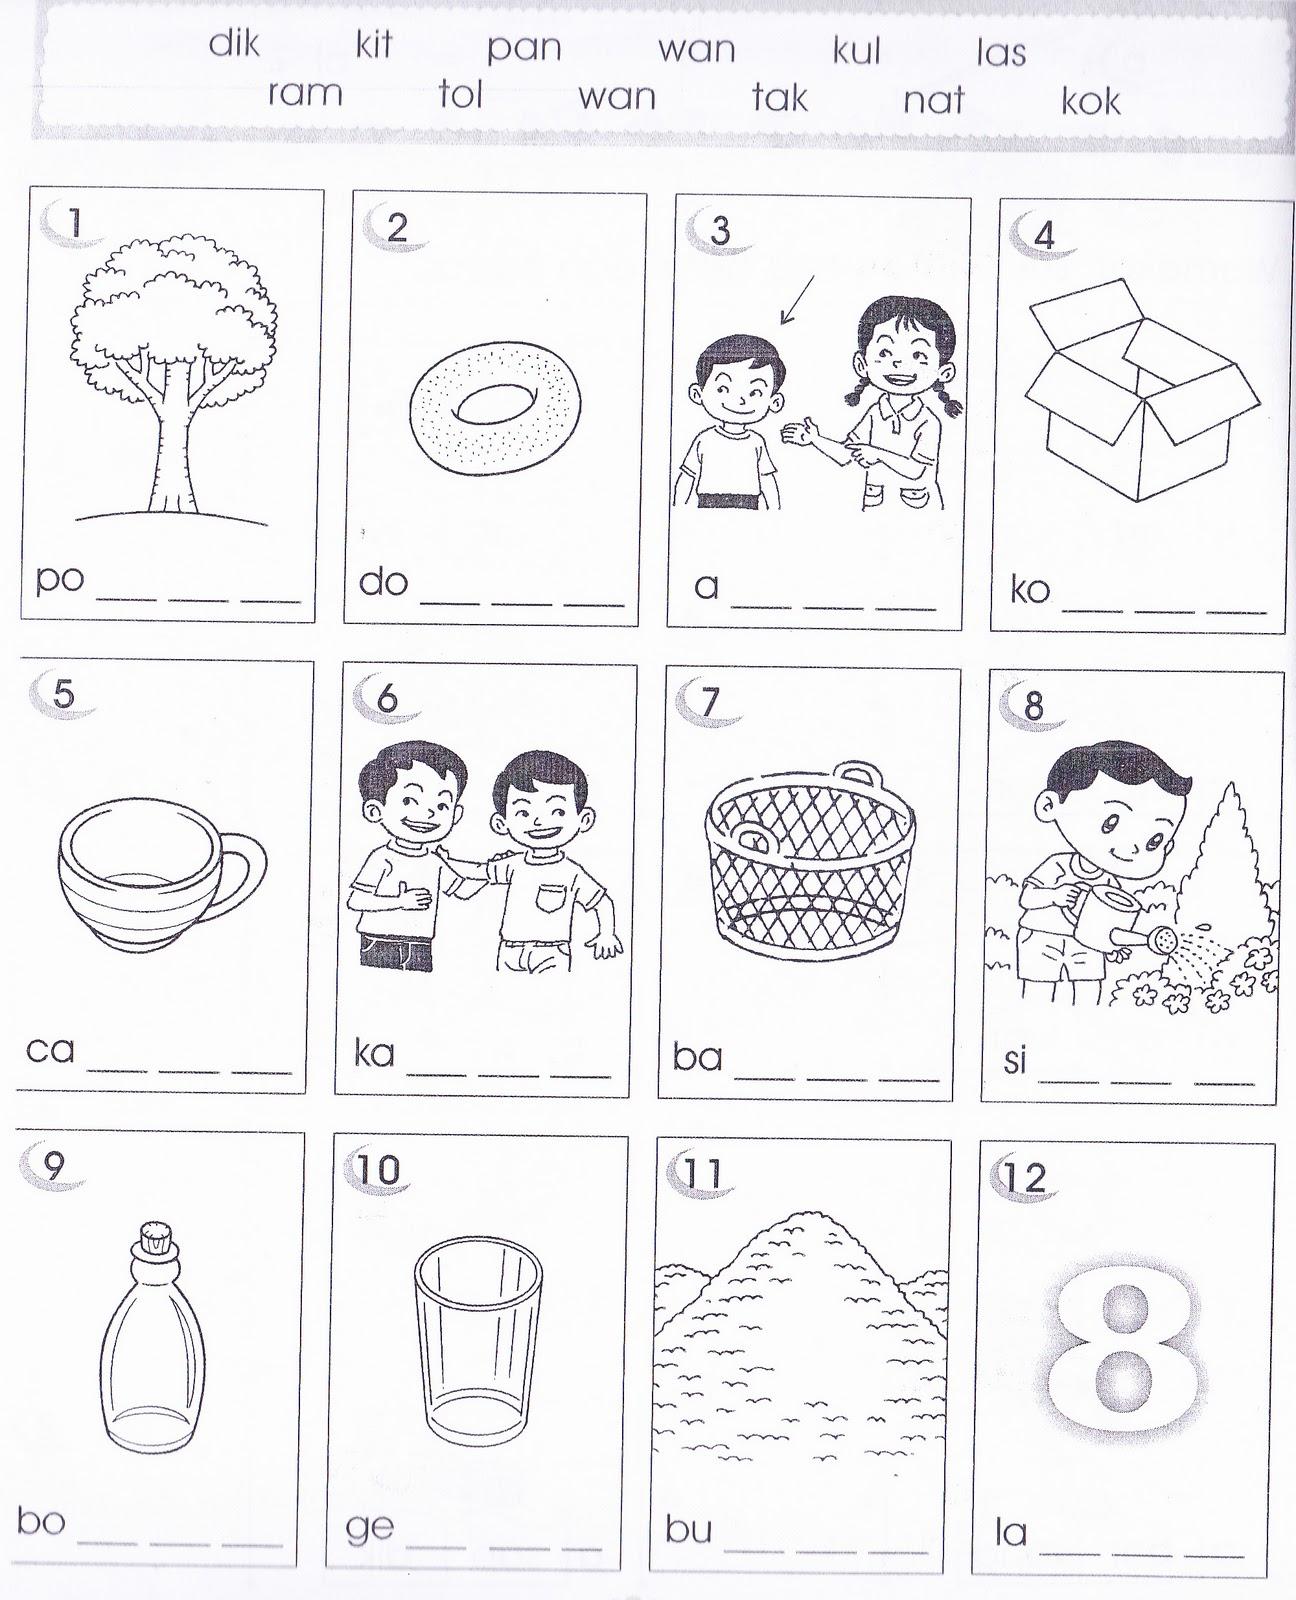 Kssr Bahasa Malaysia Tahun 1 Latihan Pengukuhan 4